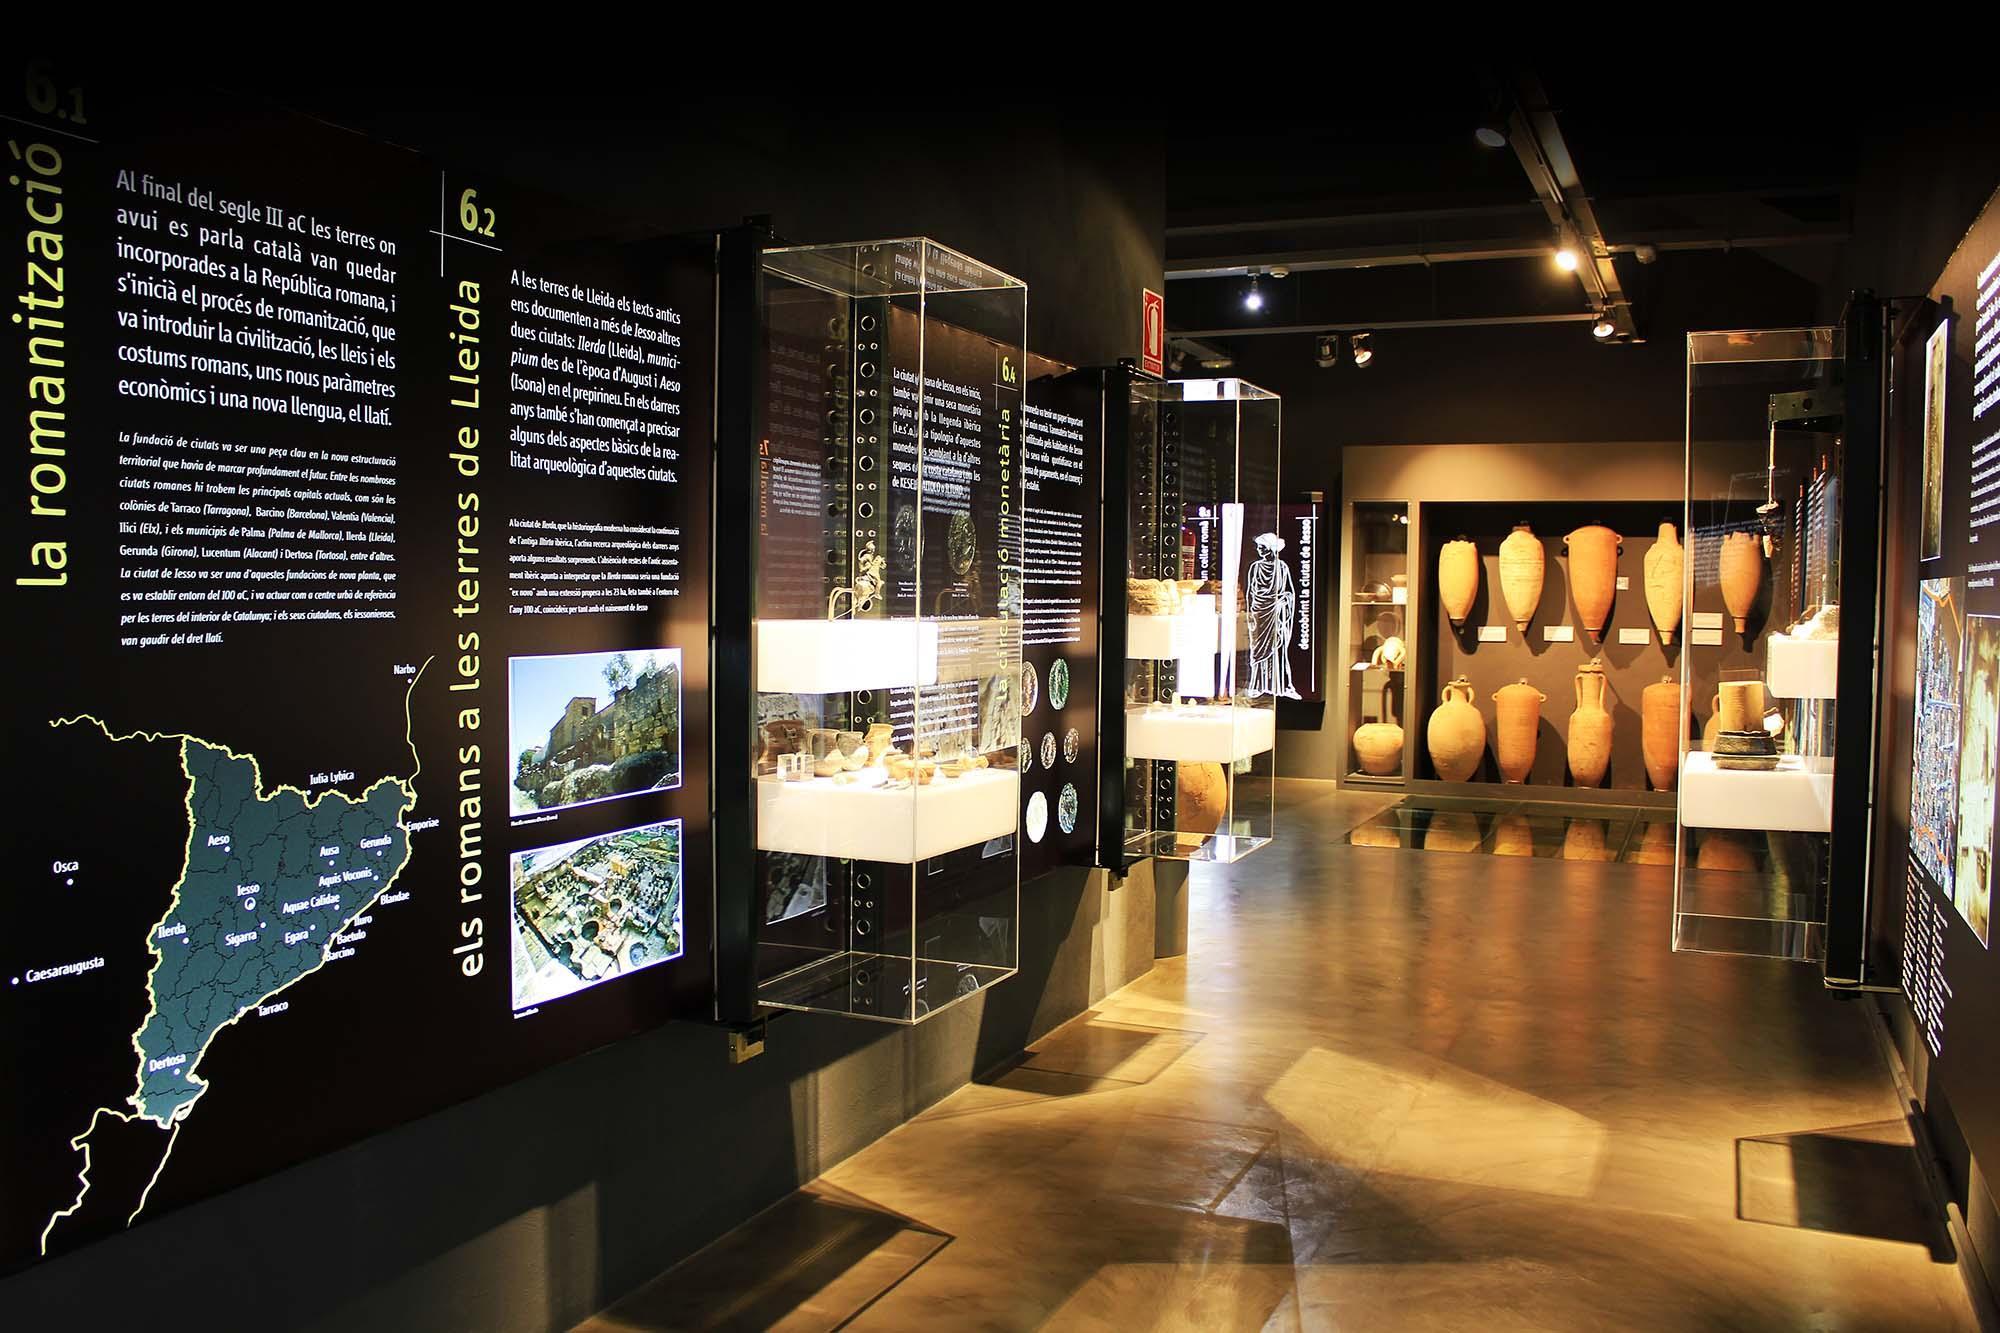 Museo Eduard Camps i Cava